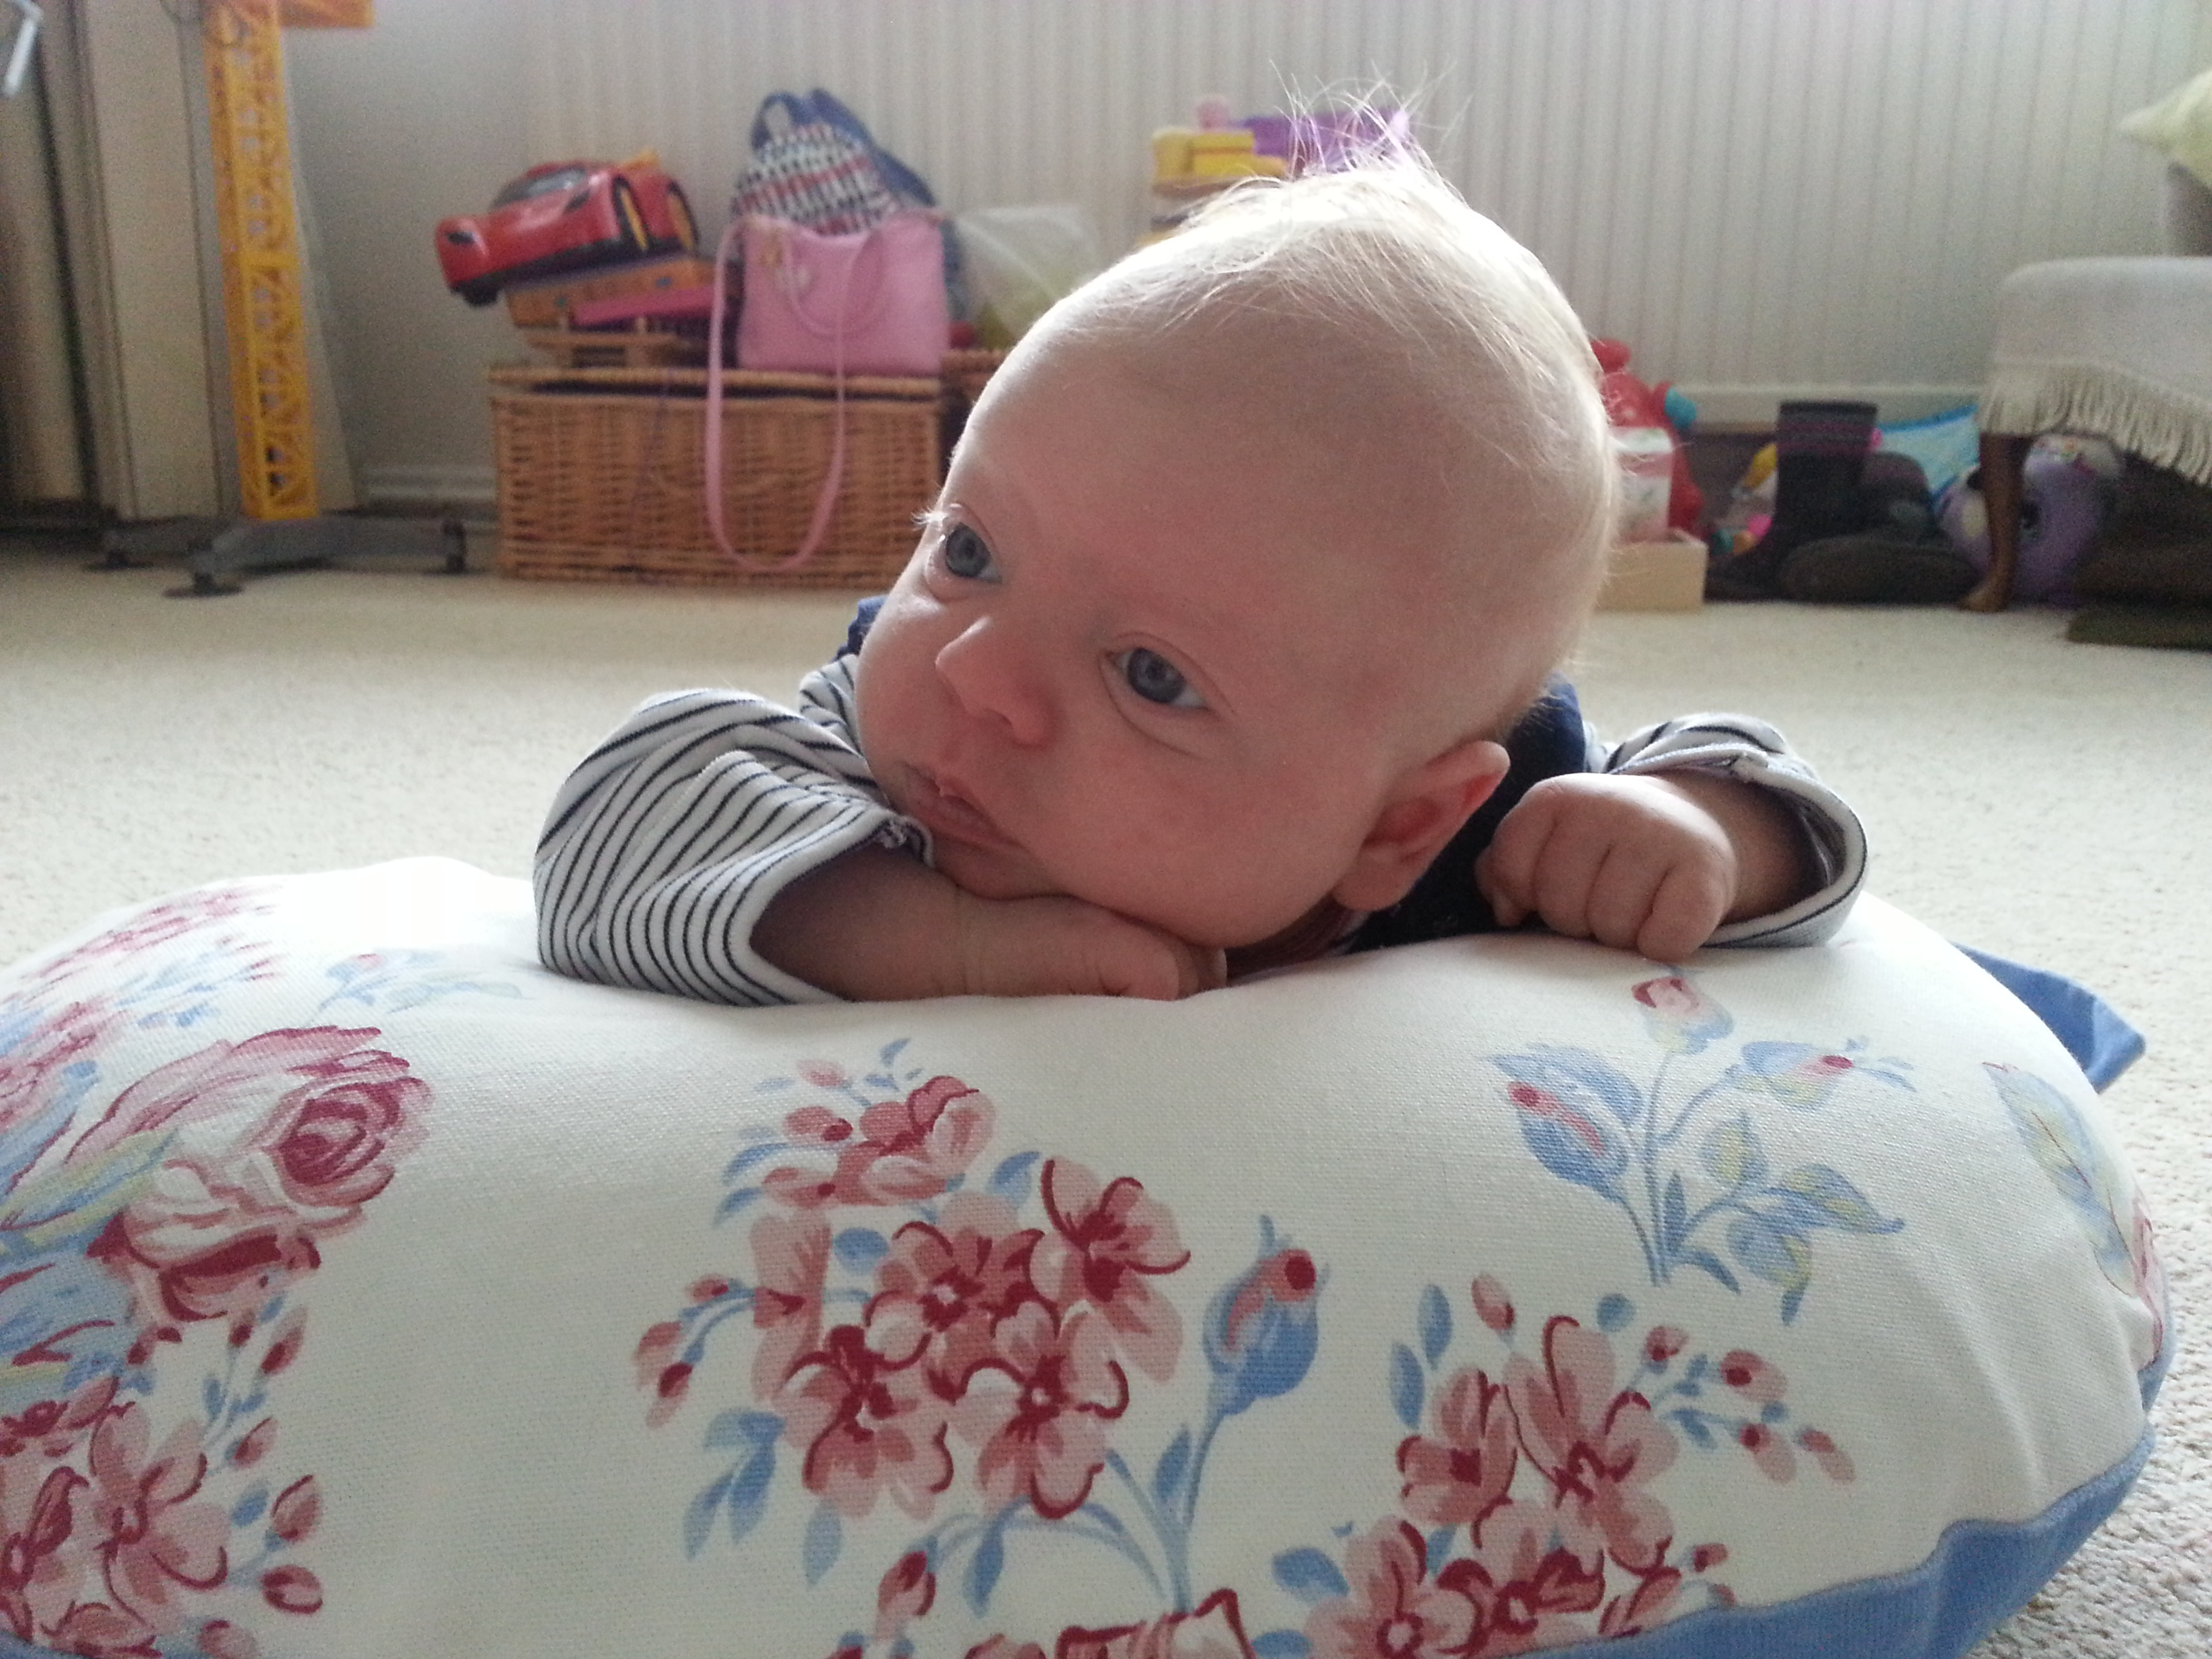 large feeding pillow baby tummy time